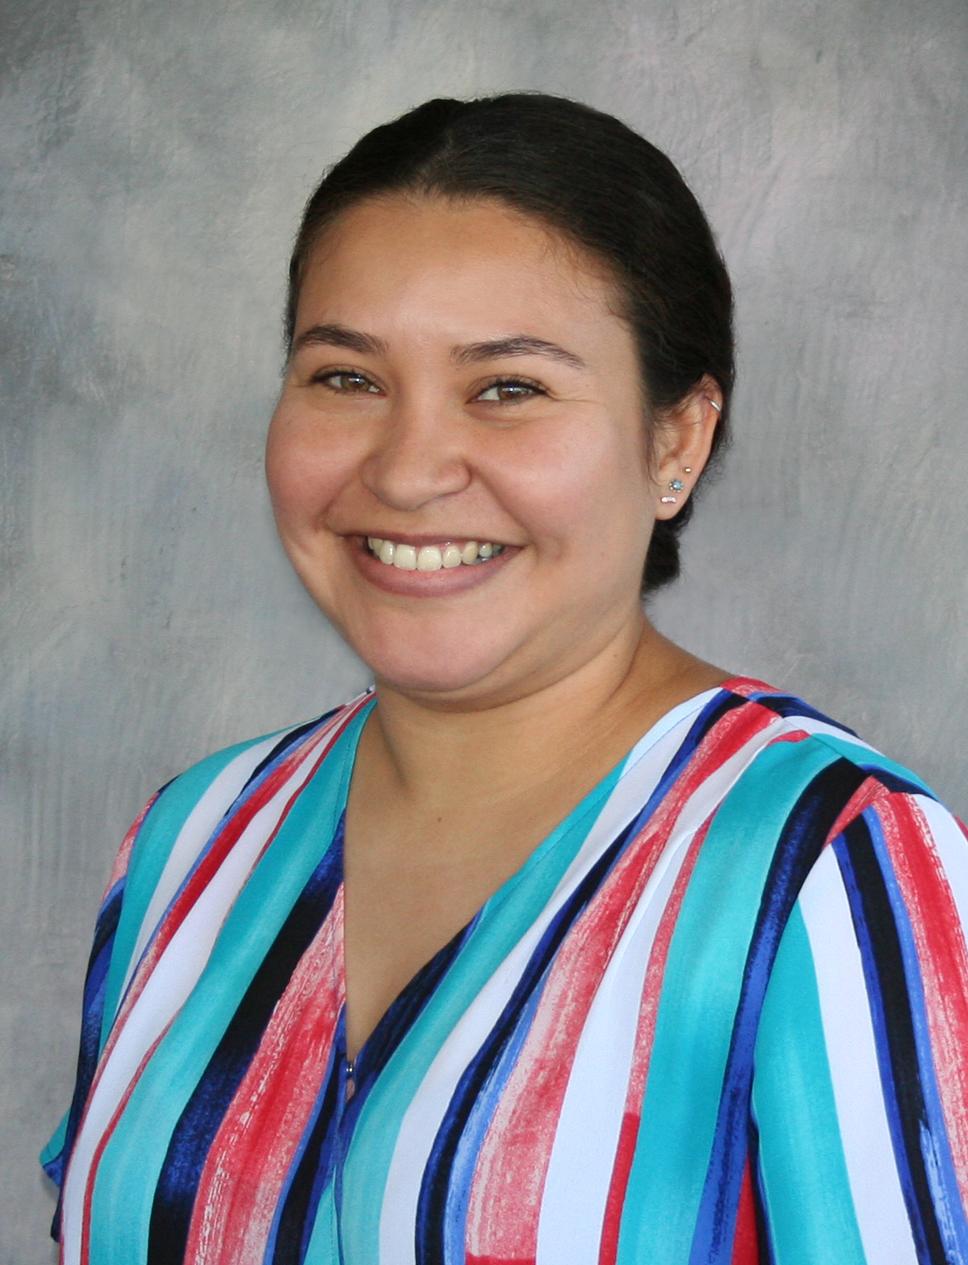 Maricela F. Cruz